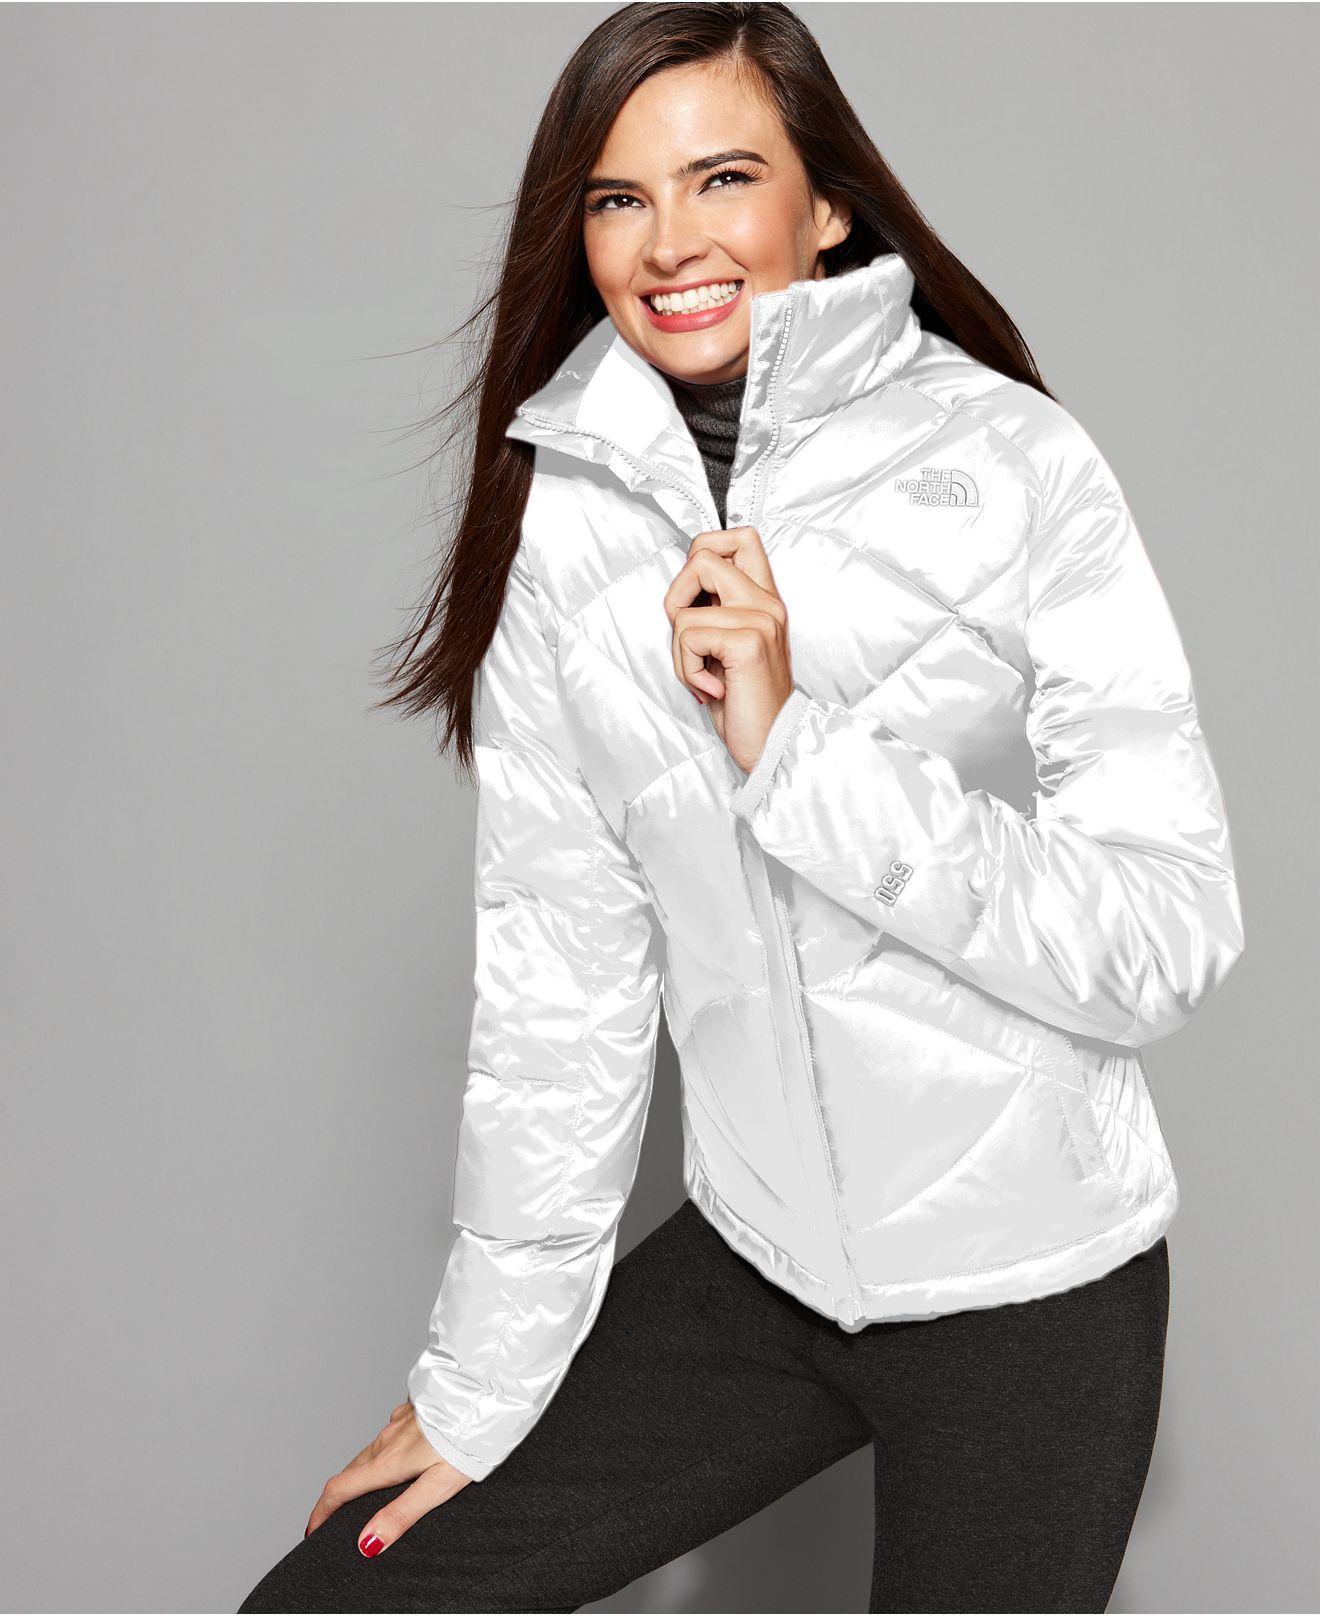 North Face Aconagua Zip Puffer Jacket Exact Same Jacket Except In Black North Face Jacket Jackets Stylish Clothes For Women [ 1616 x 1320 Pixel ]